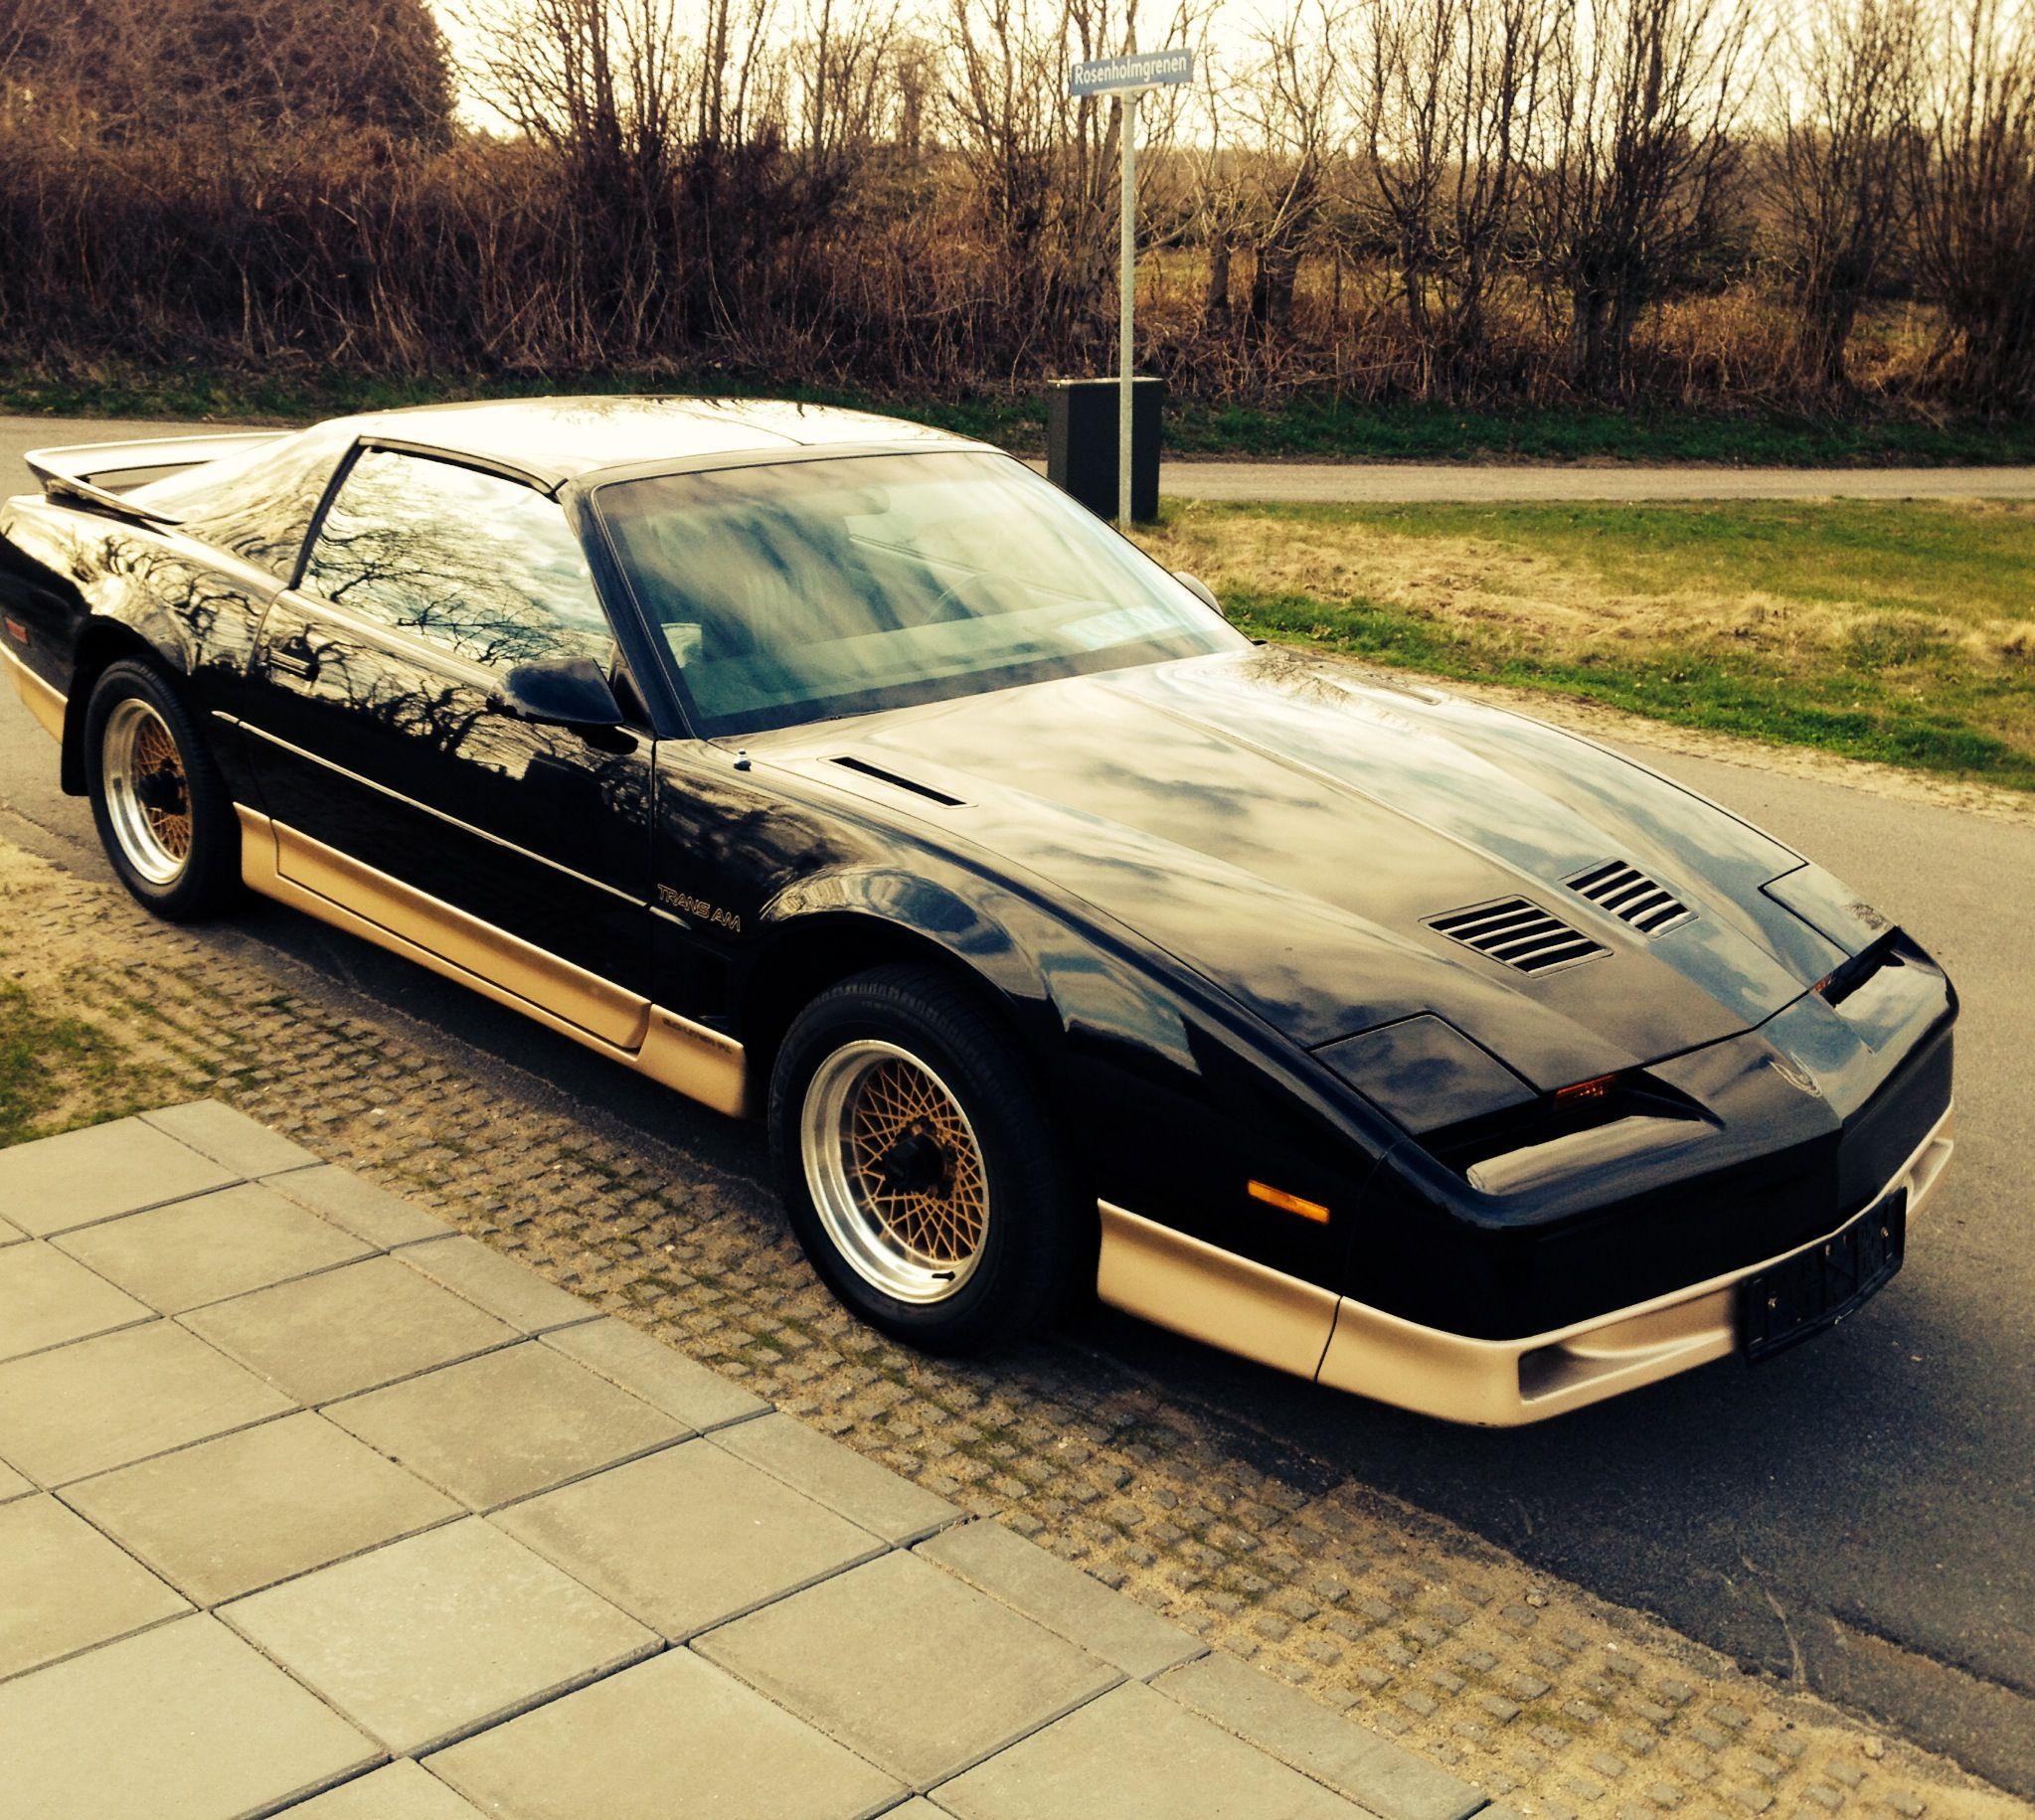 1987 Pontiac Firebird Trans Am Black/Gold edition